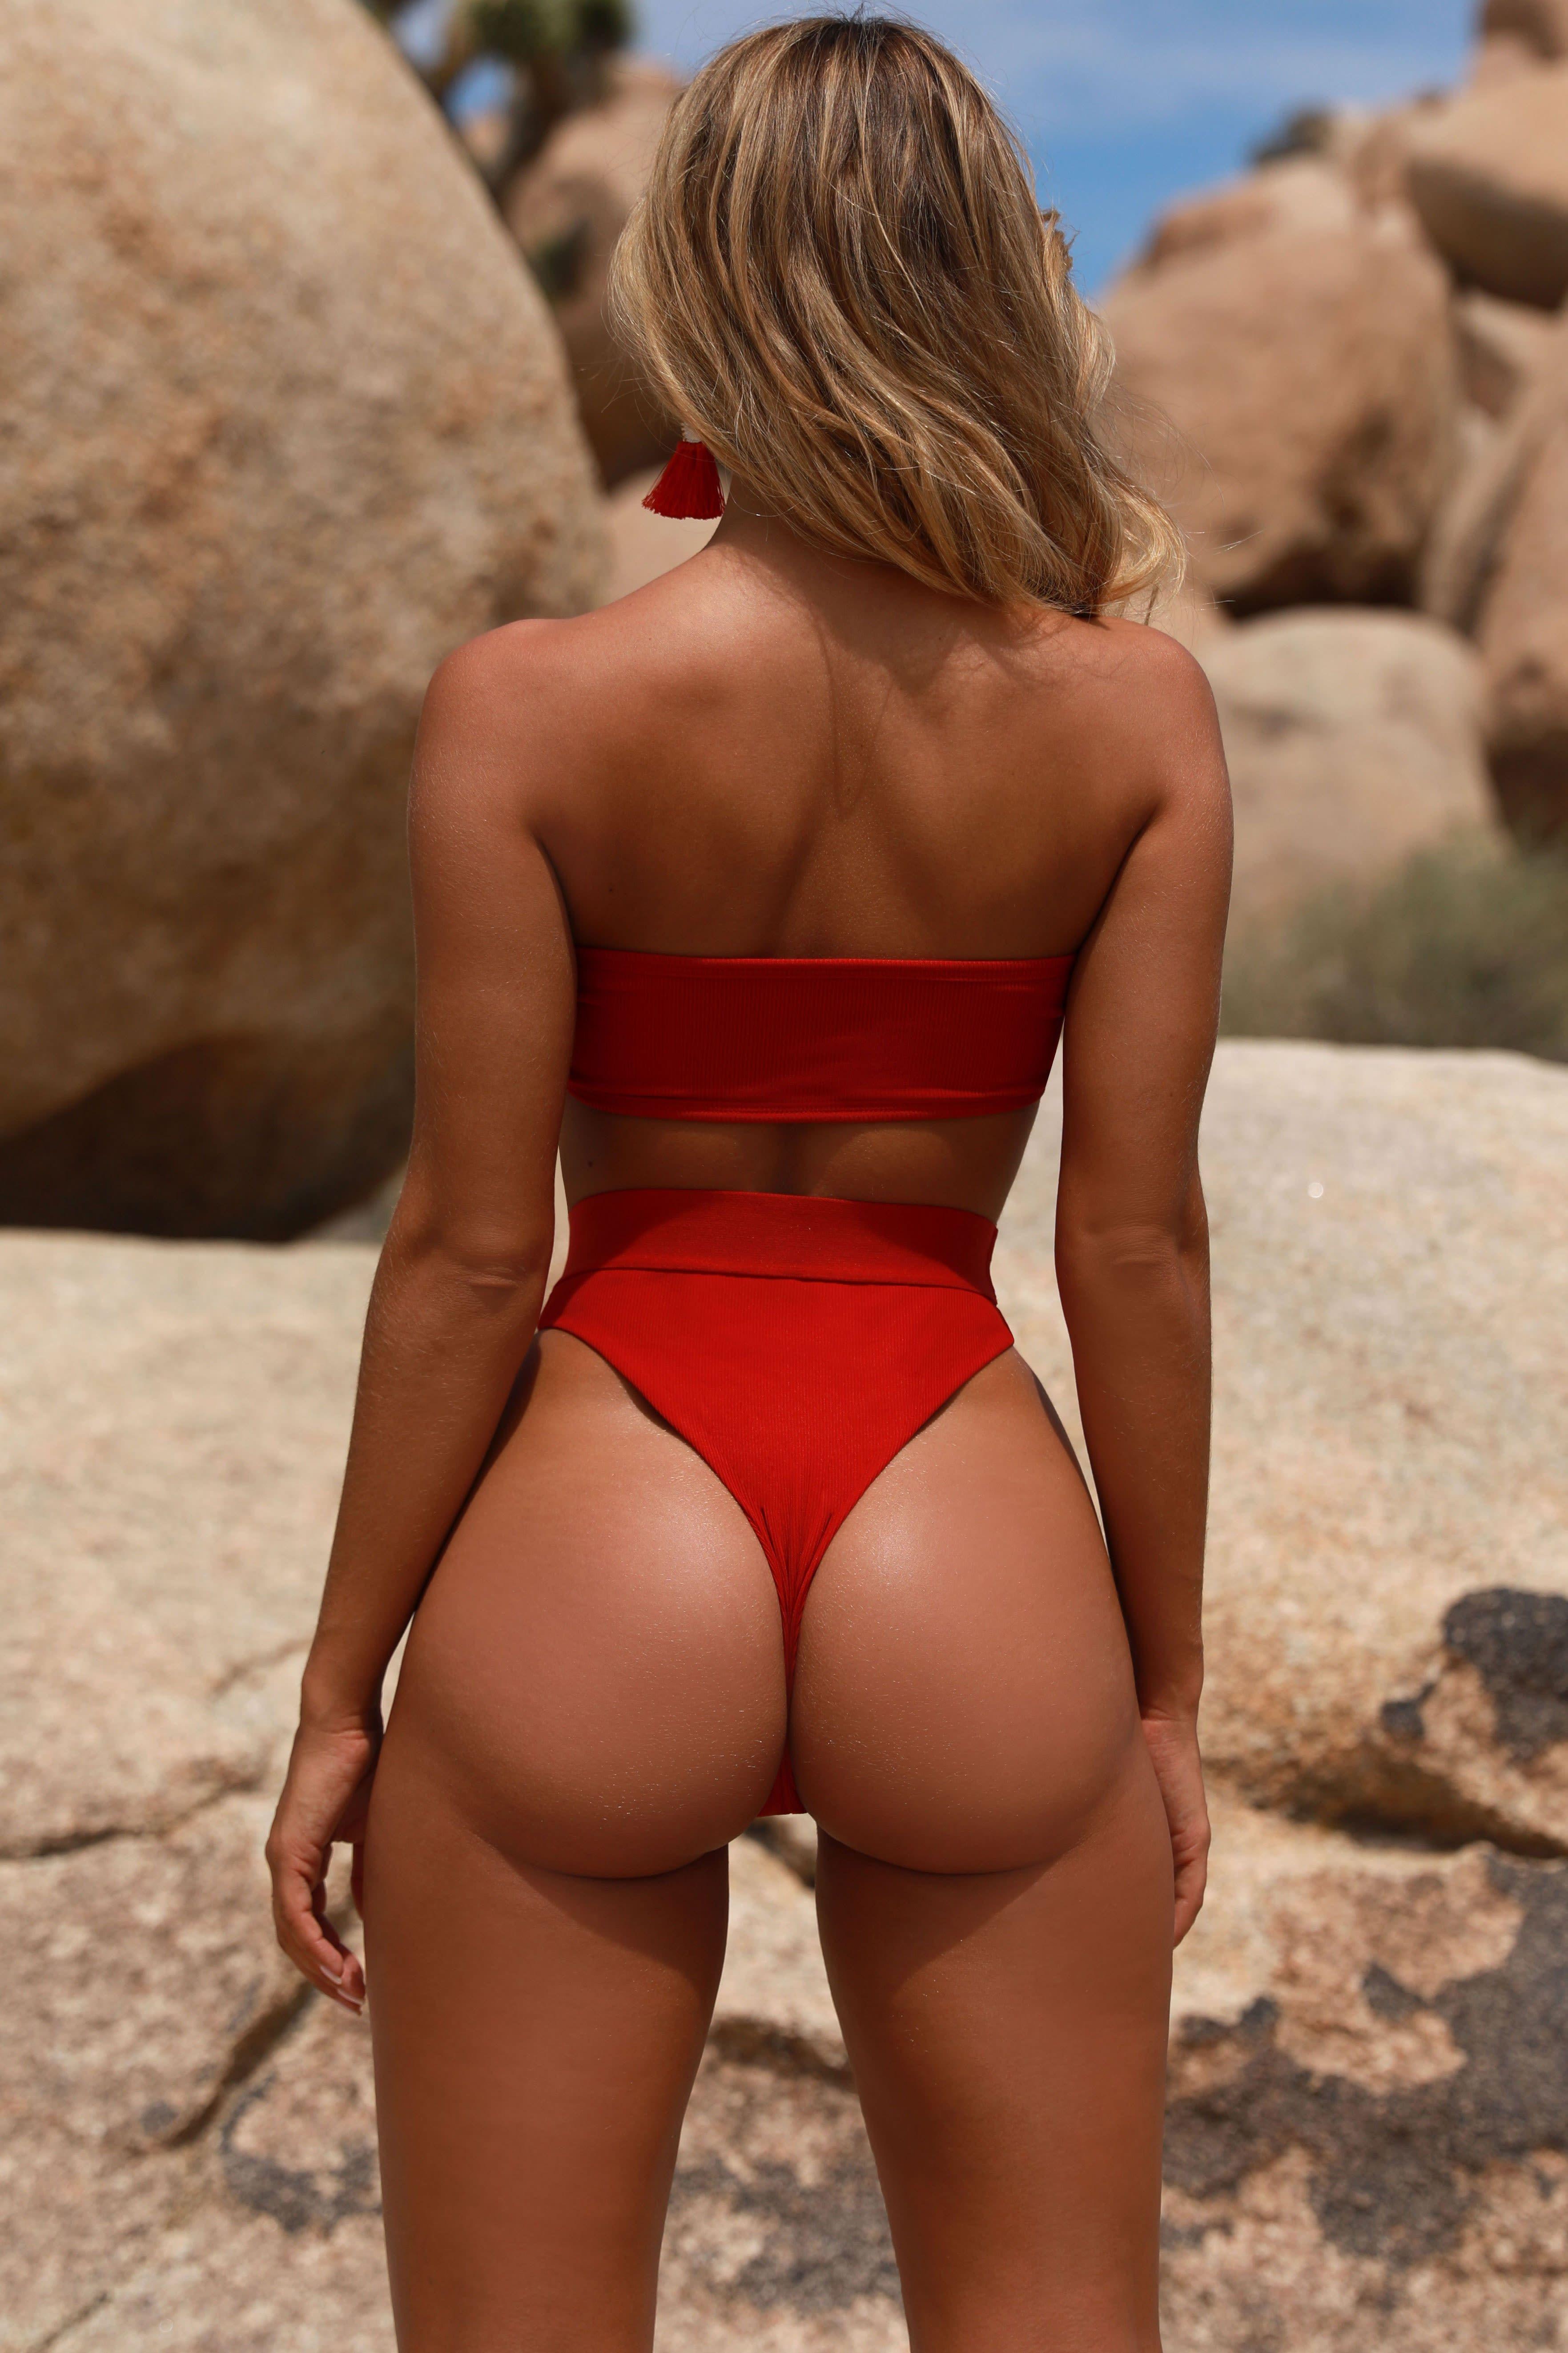 f91da5561ede56 Welcome To Miami Ribbed High Leg Thong Bikini Bottoms in Red ...